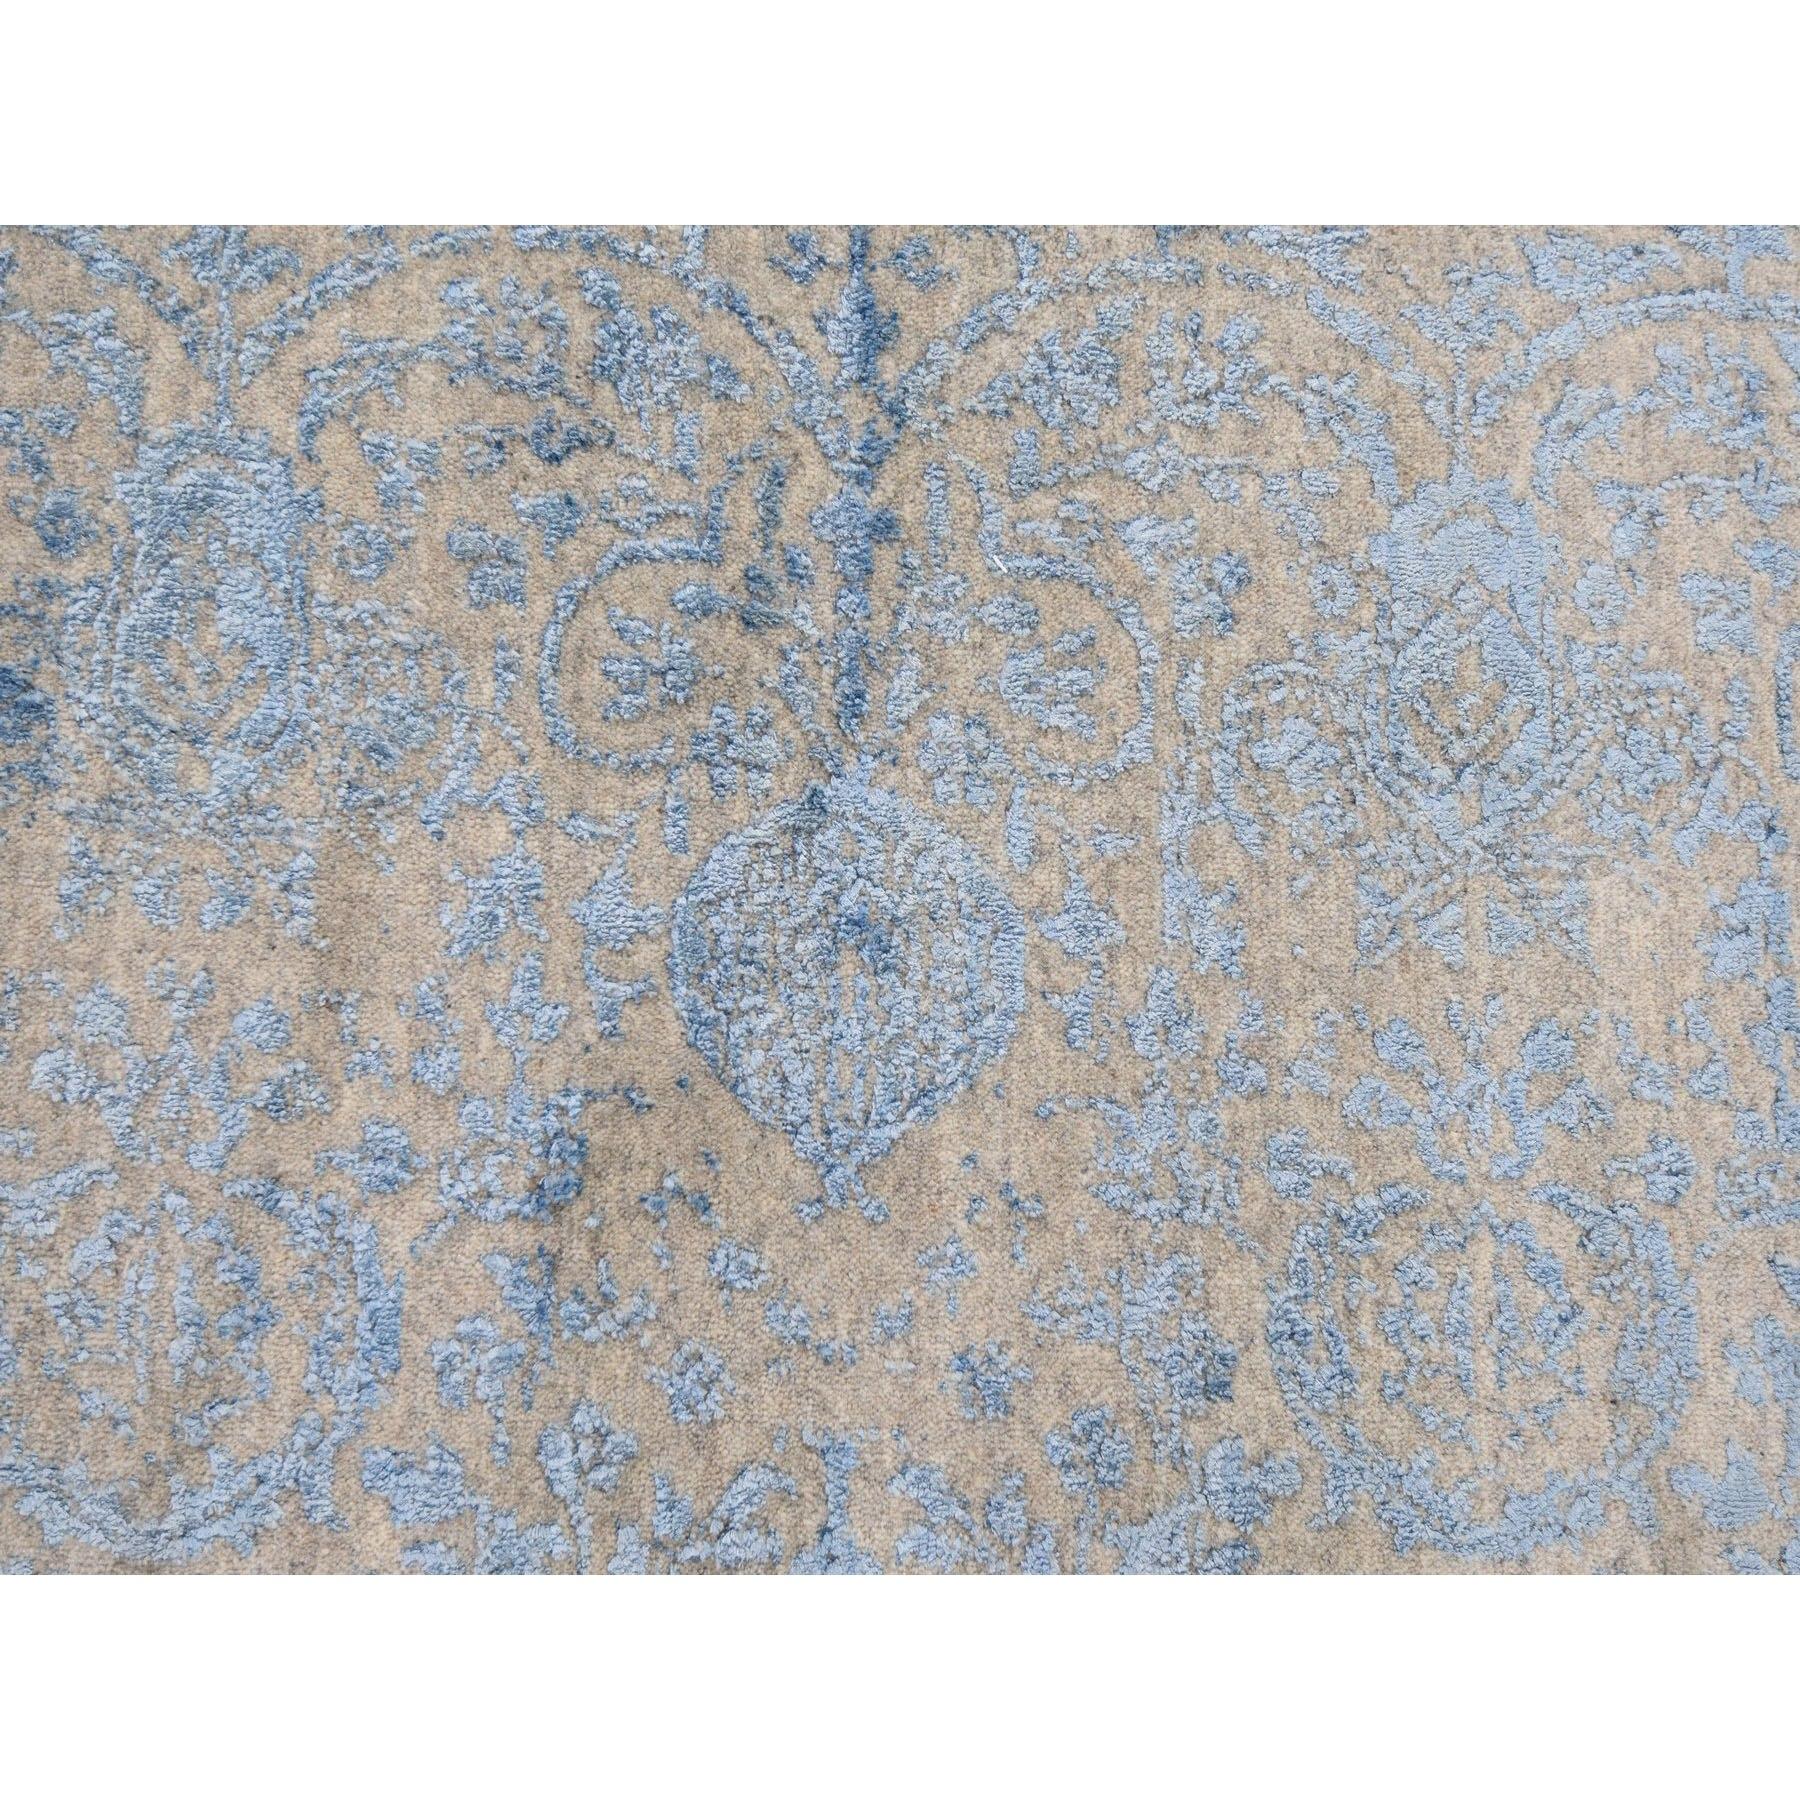 5-10 x8-9  Hand Loomed Broken Pomegranate Design Tone on Tone Oriental Rug